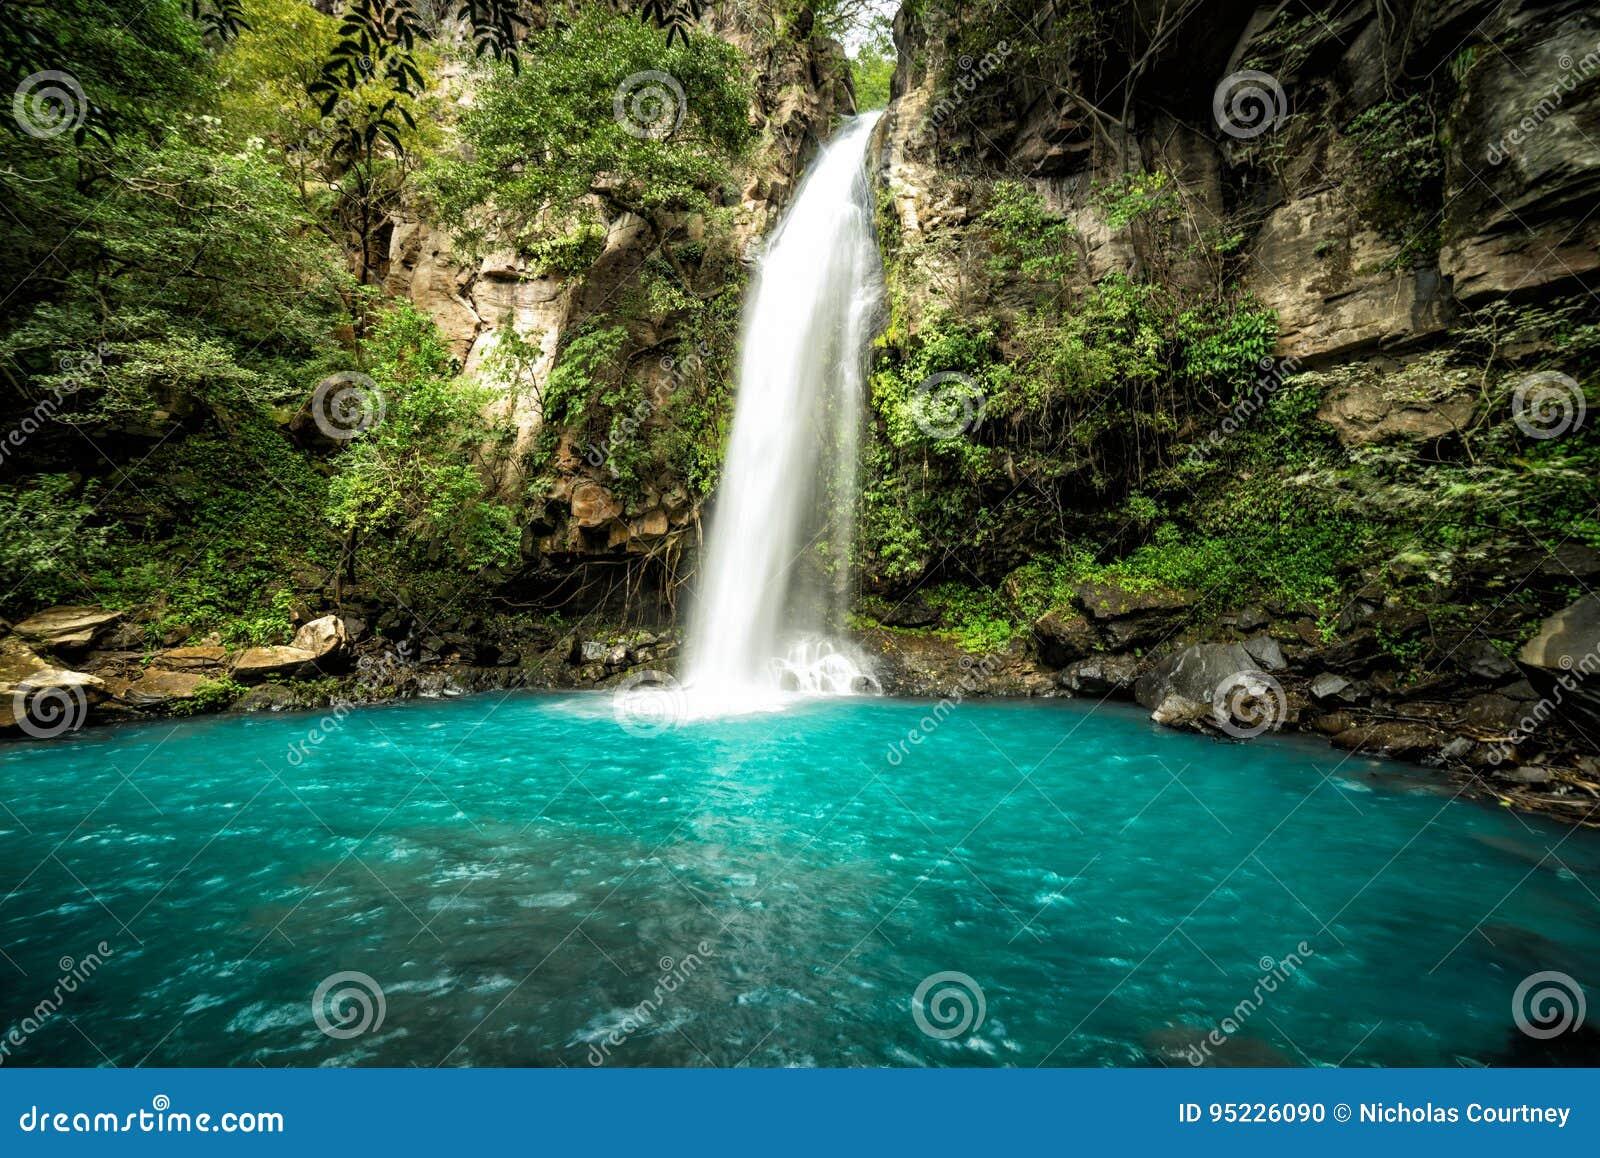 `La Cangreja` Waterfall, Costa Rica. A beautiful pristine waterfall in the rainforest jungles of Costa Rica